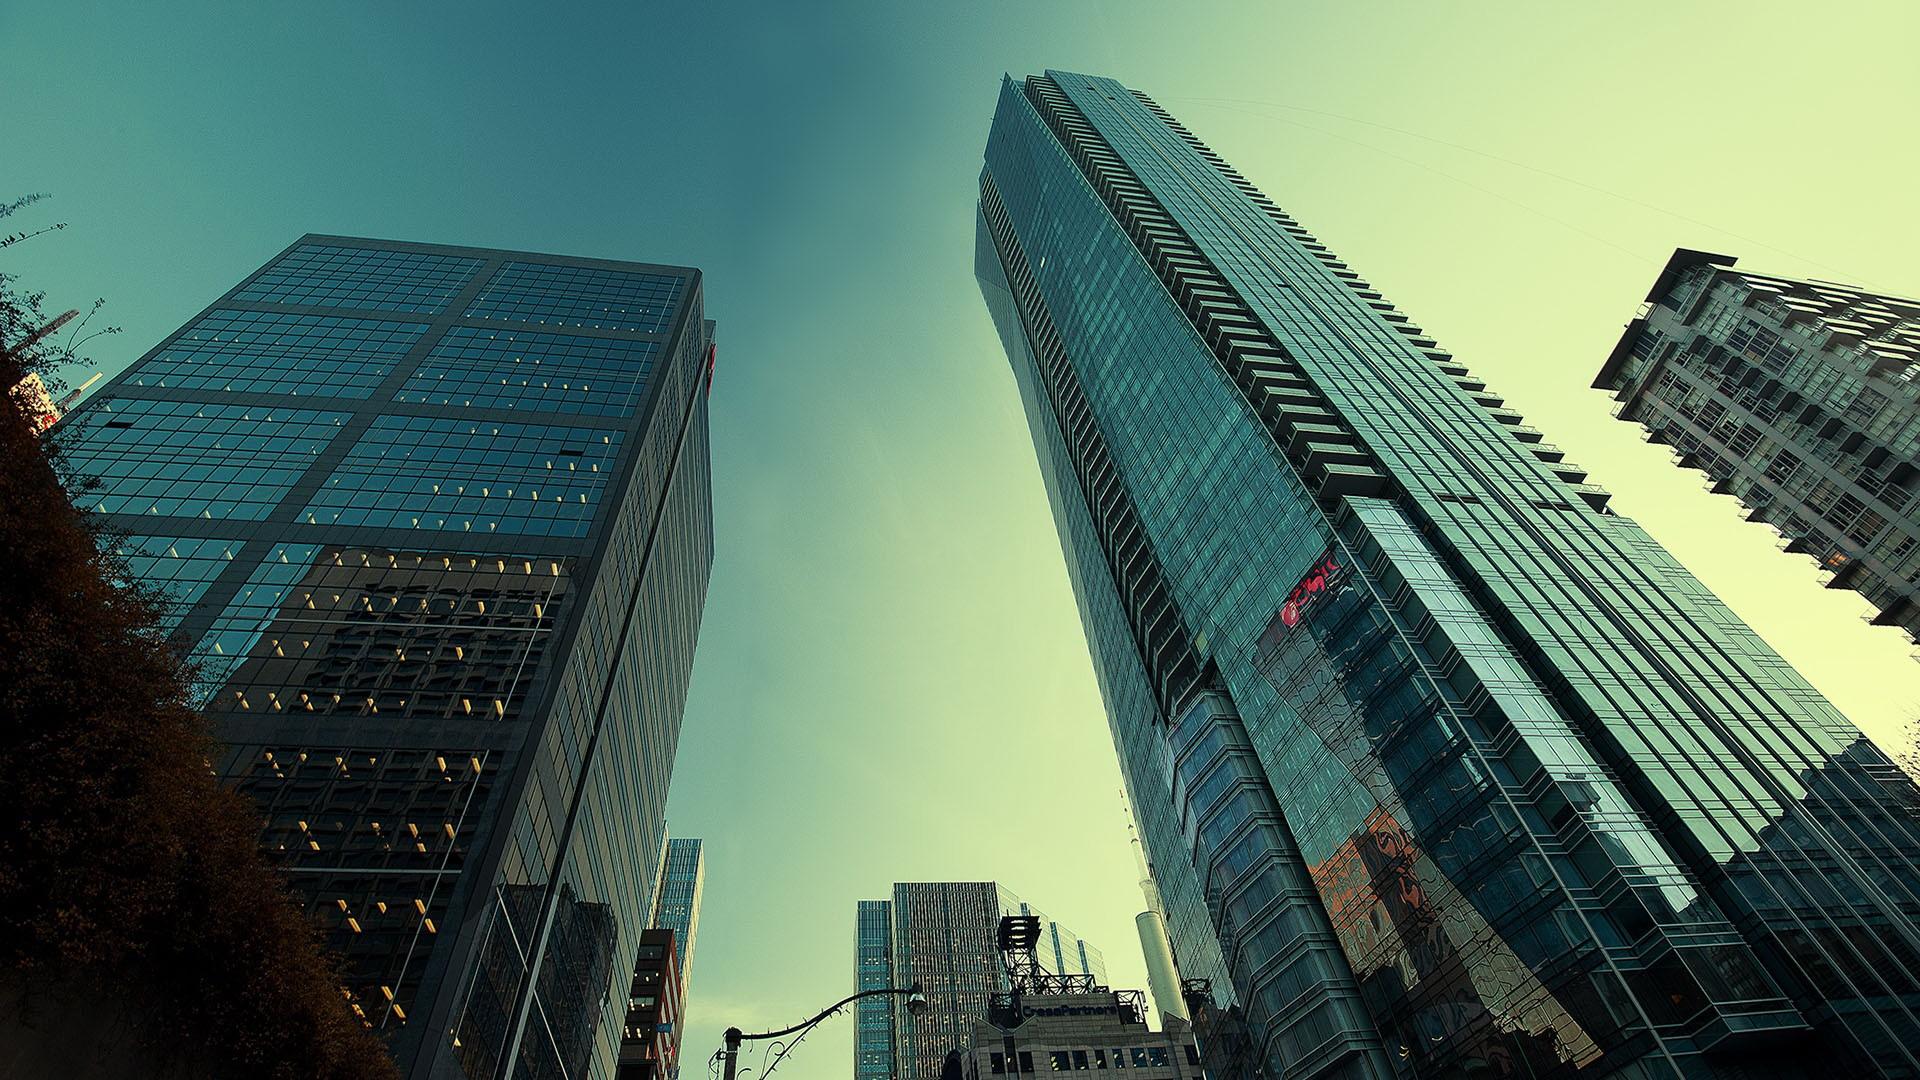 Skyscraper Wallpaper